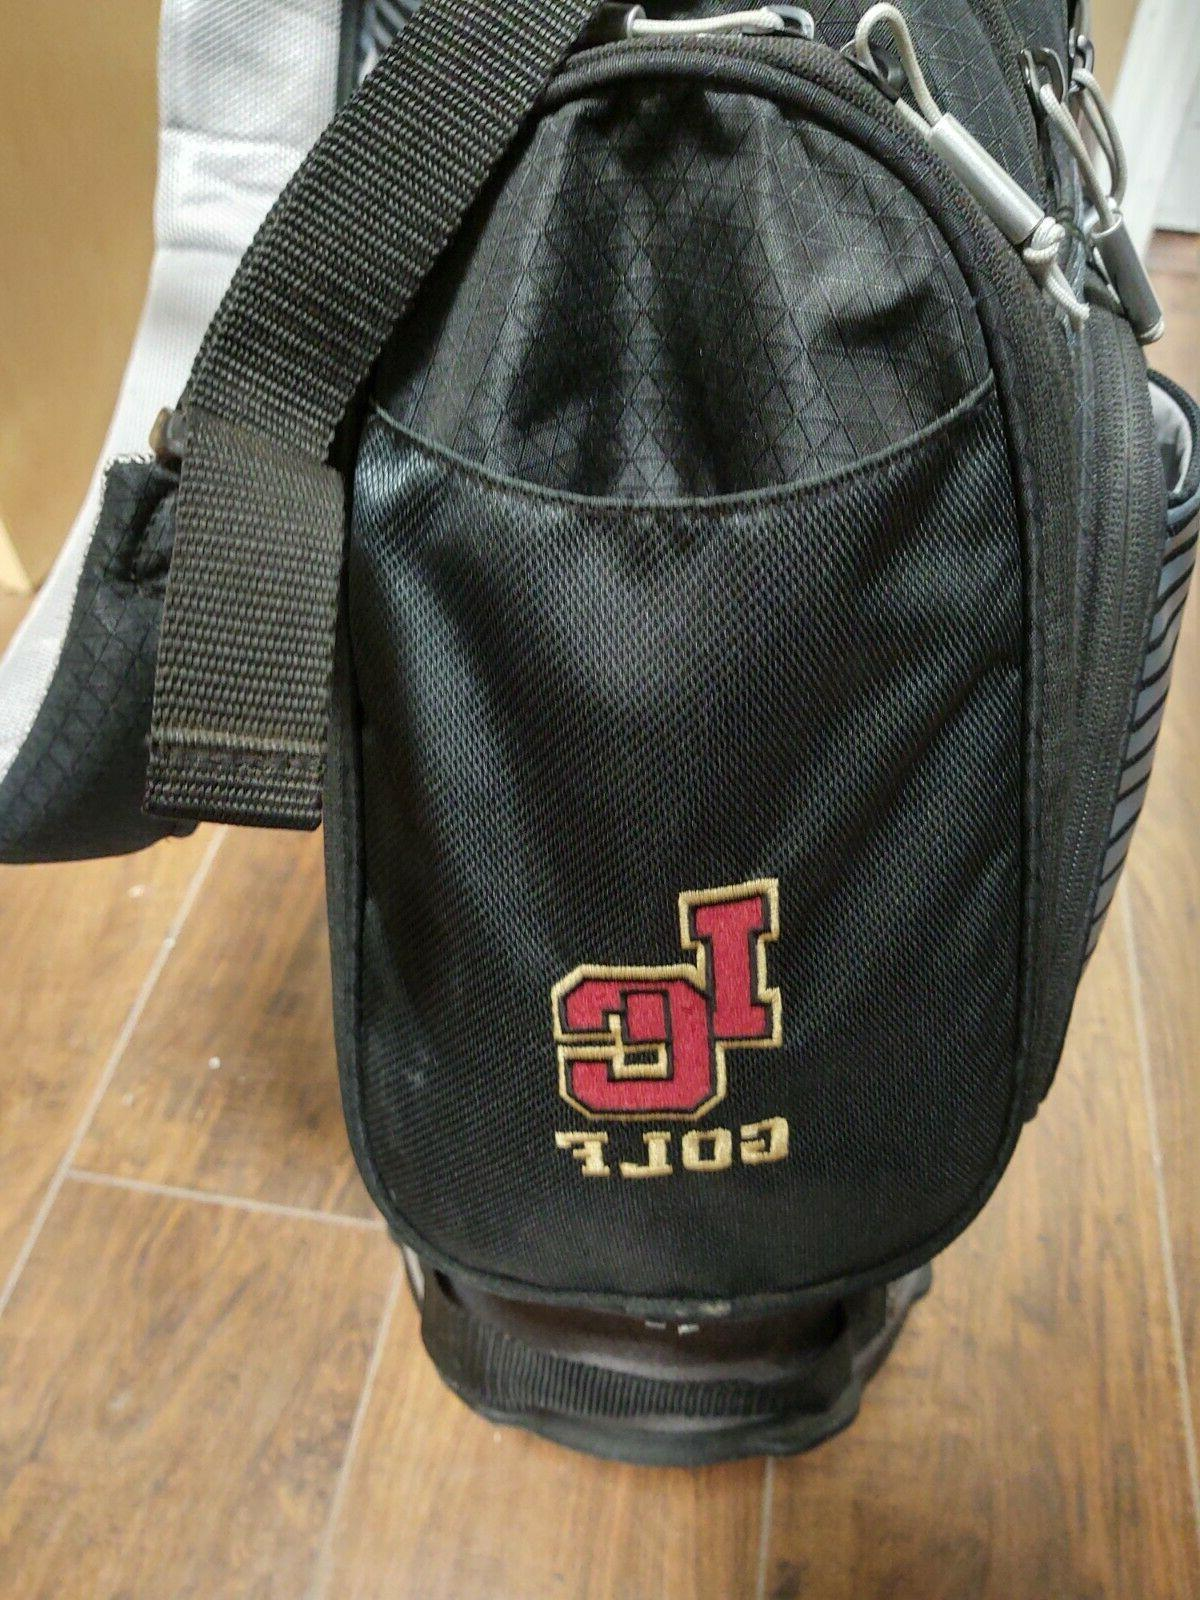 Nike Divider Dual Stand Bag Black/Gray